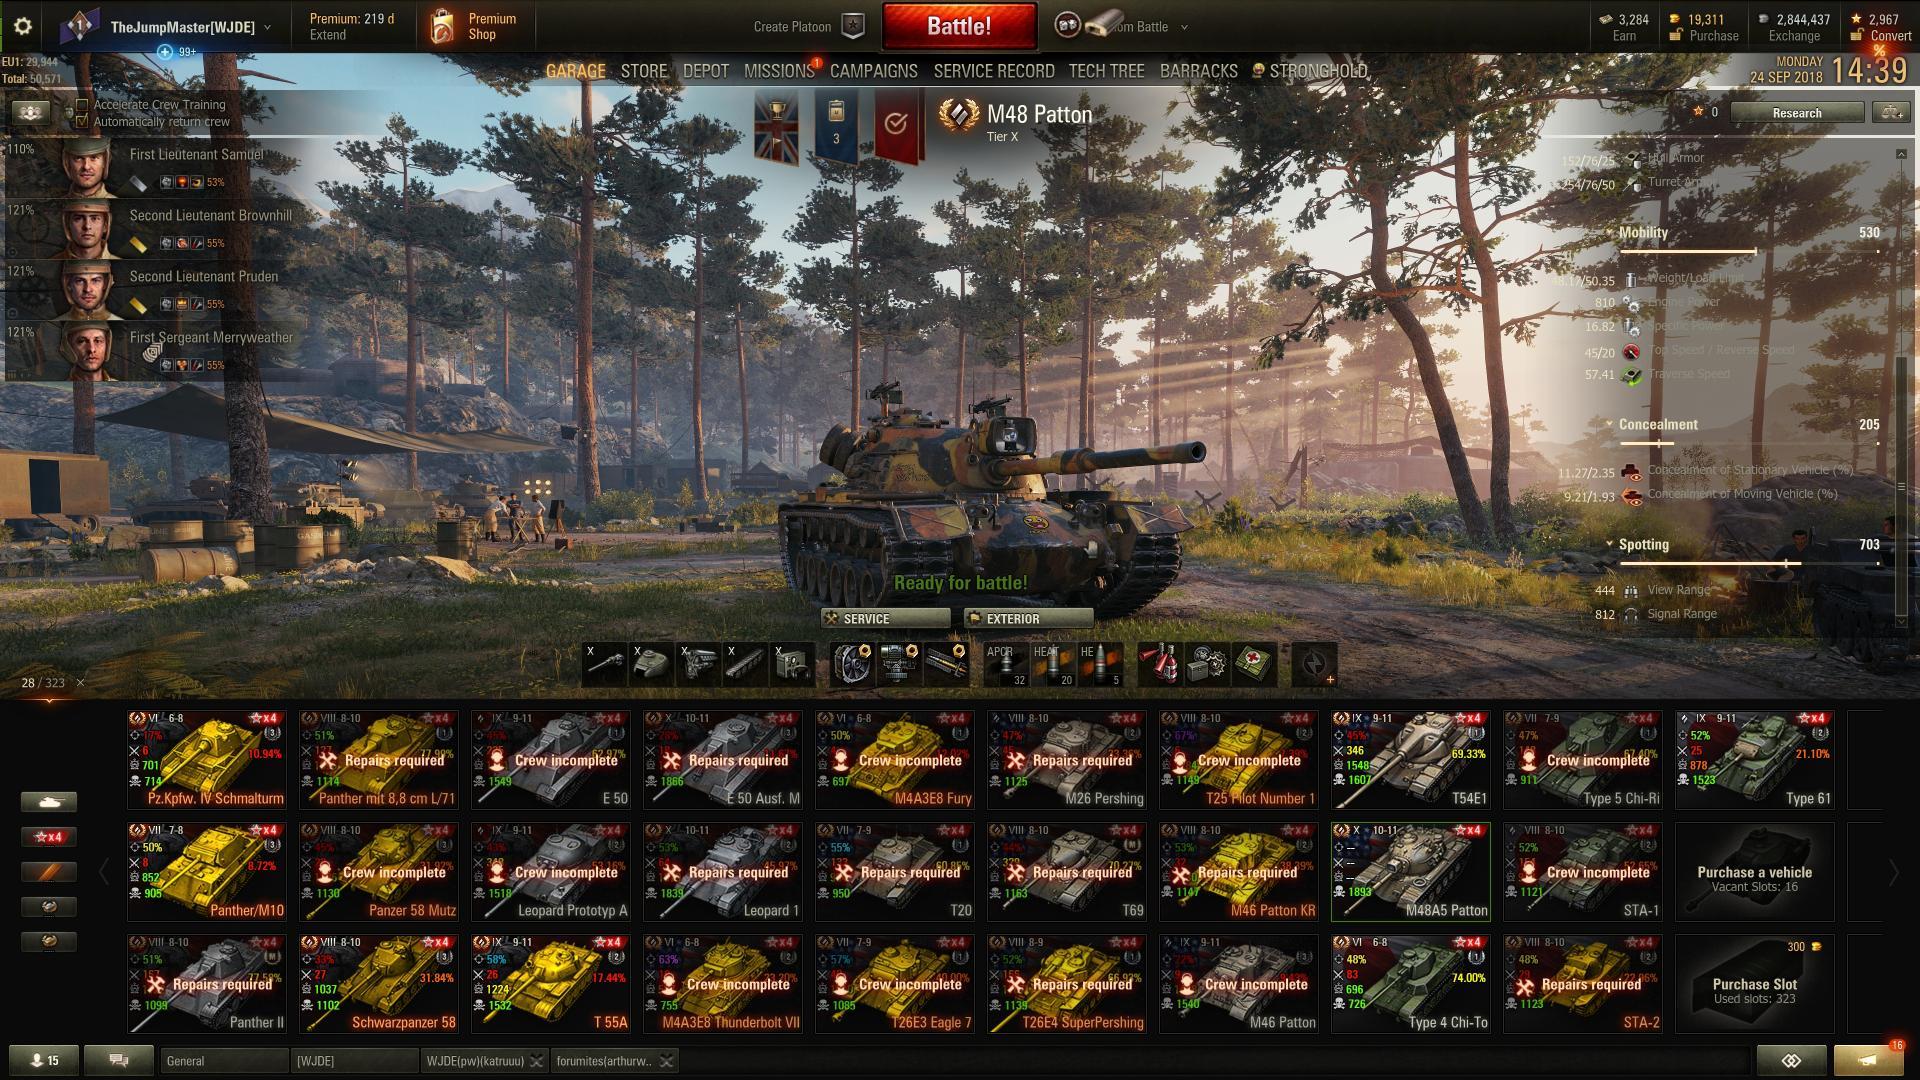 M48 Patton - Gameplay - World of Tanks ...